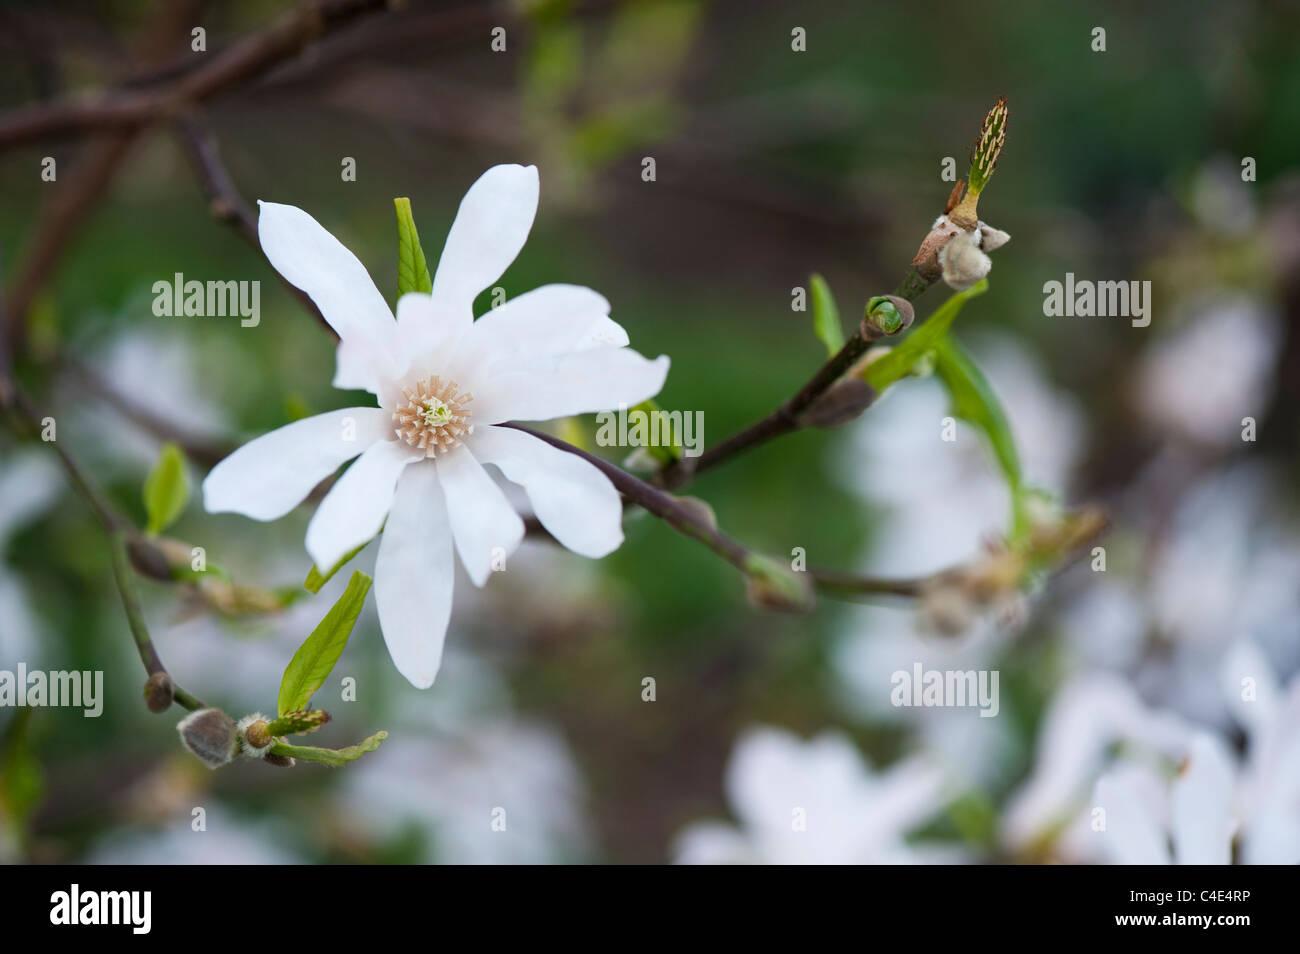 Magnolia x loebneri 'leonard messel' flower - Stock Image